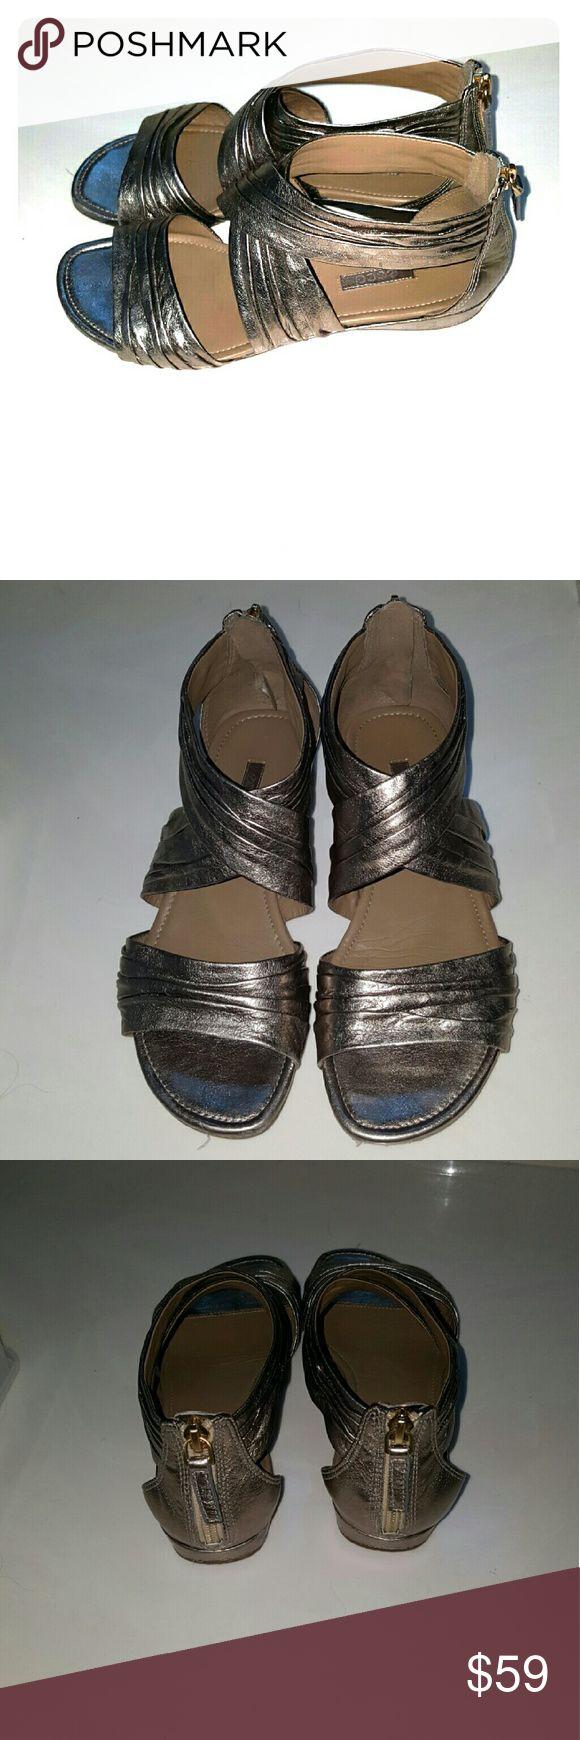 ECCO Sandals Stylish, comfortable, like new silver ECCO Sandals. Ecco Shoes Sandals